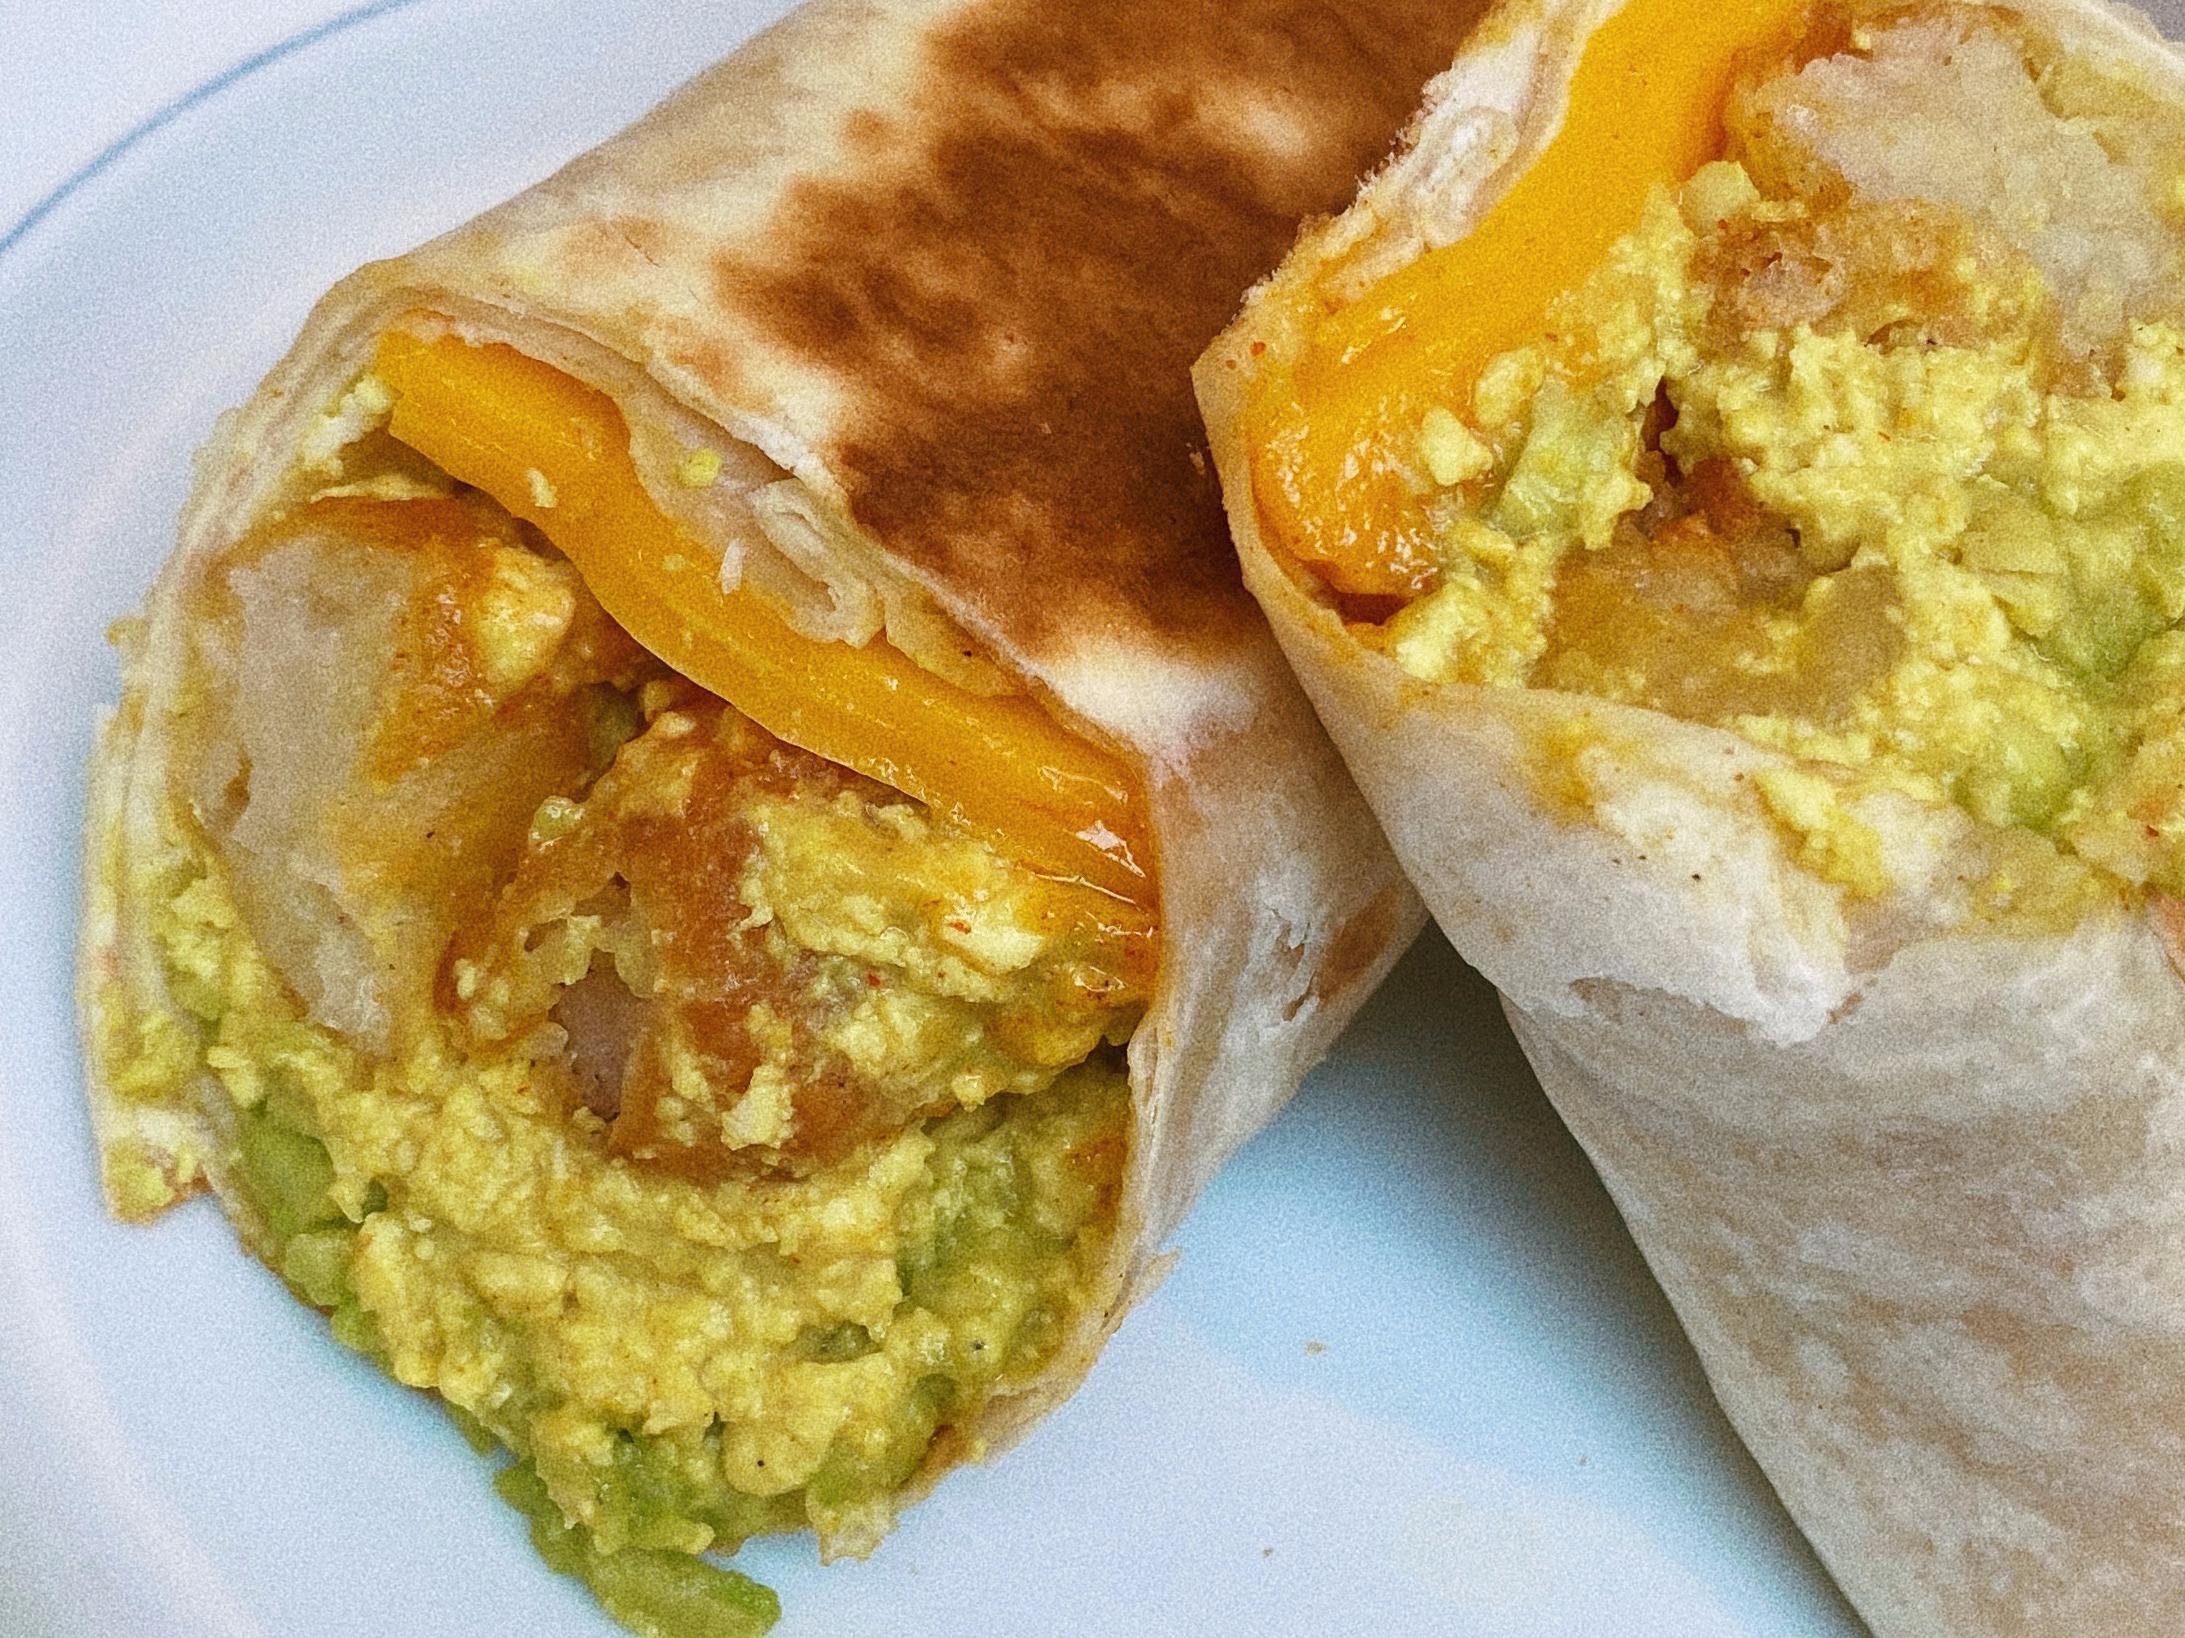 vegan breakfast burrito featured